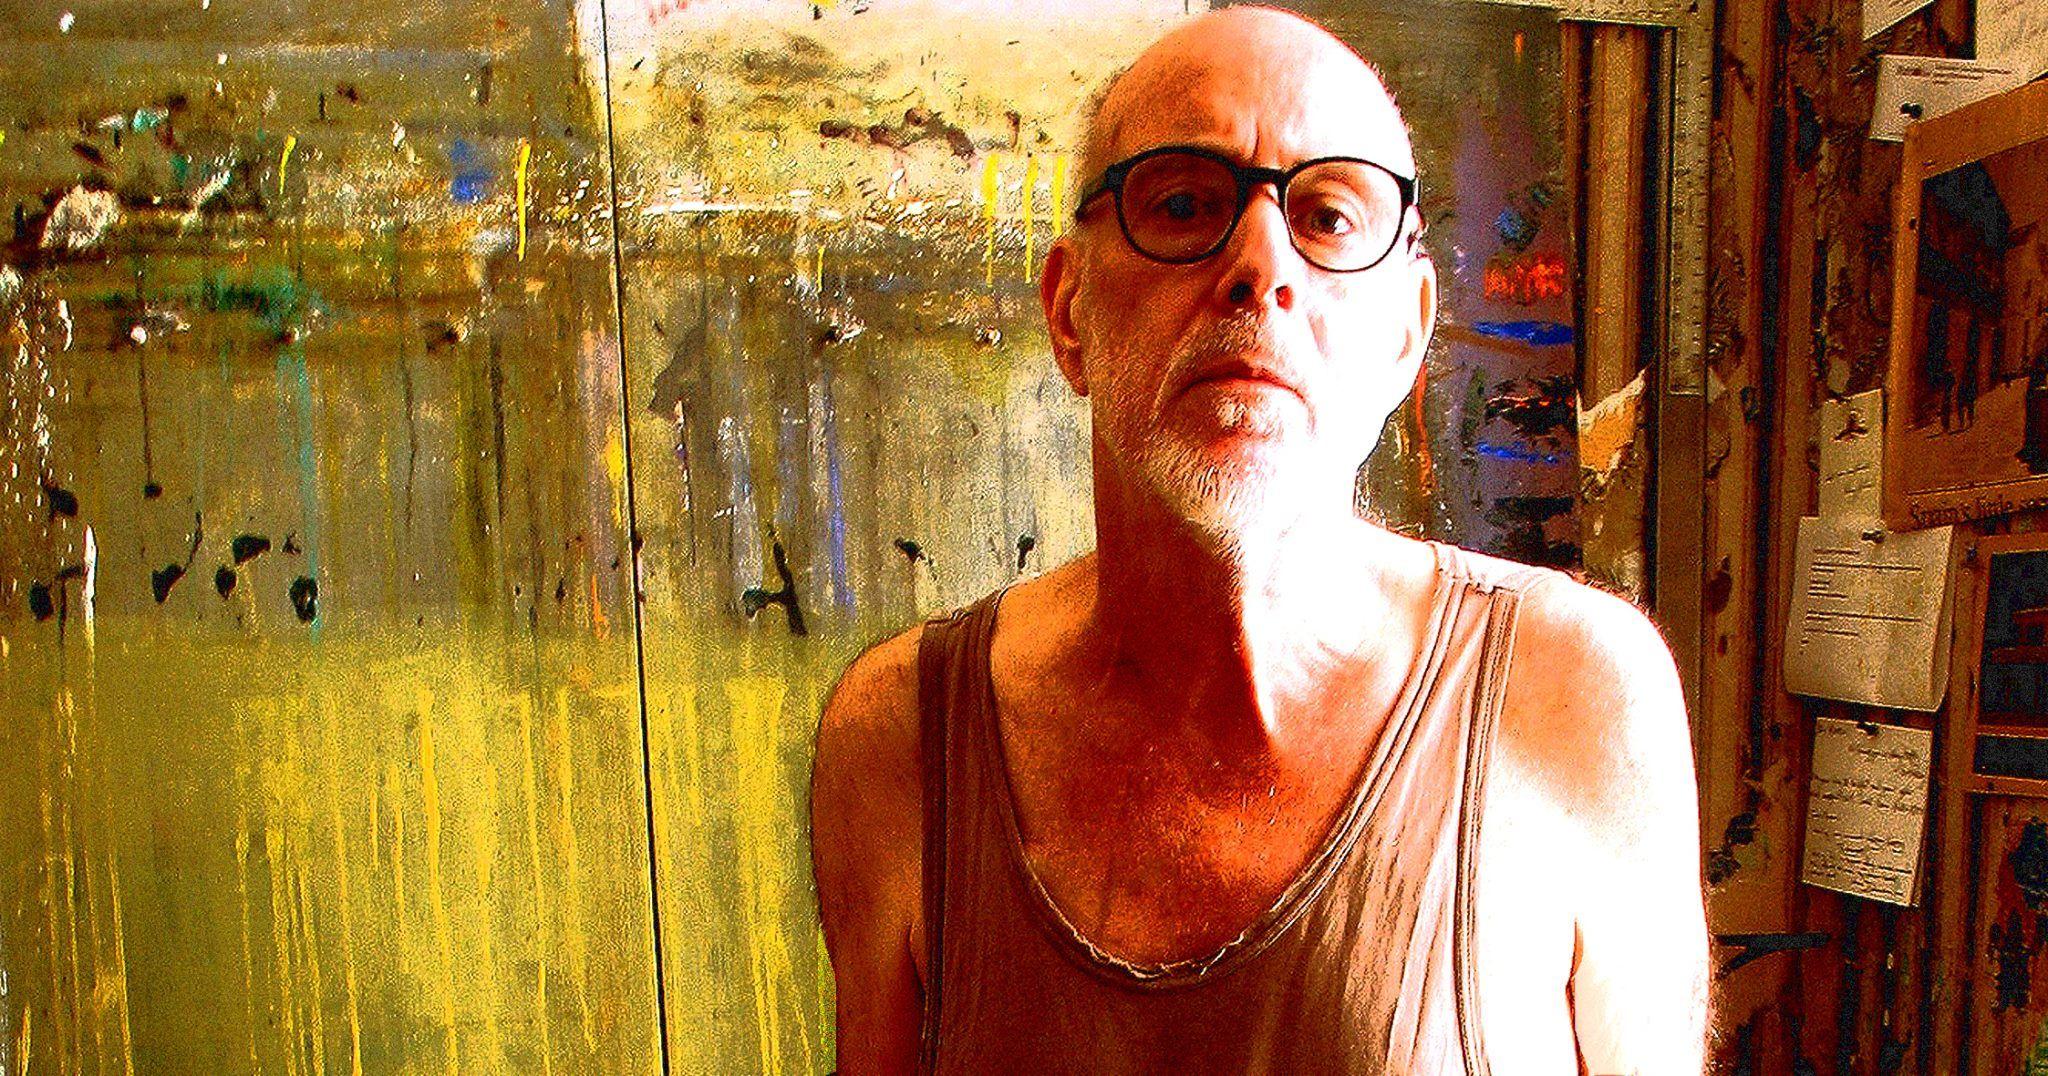 Marcus Reichert in his studio.